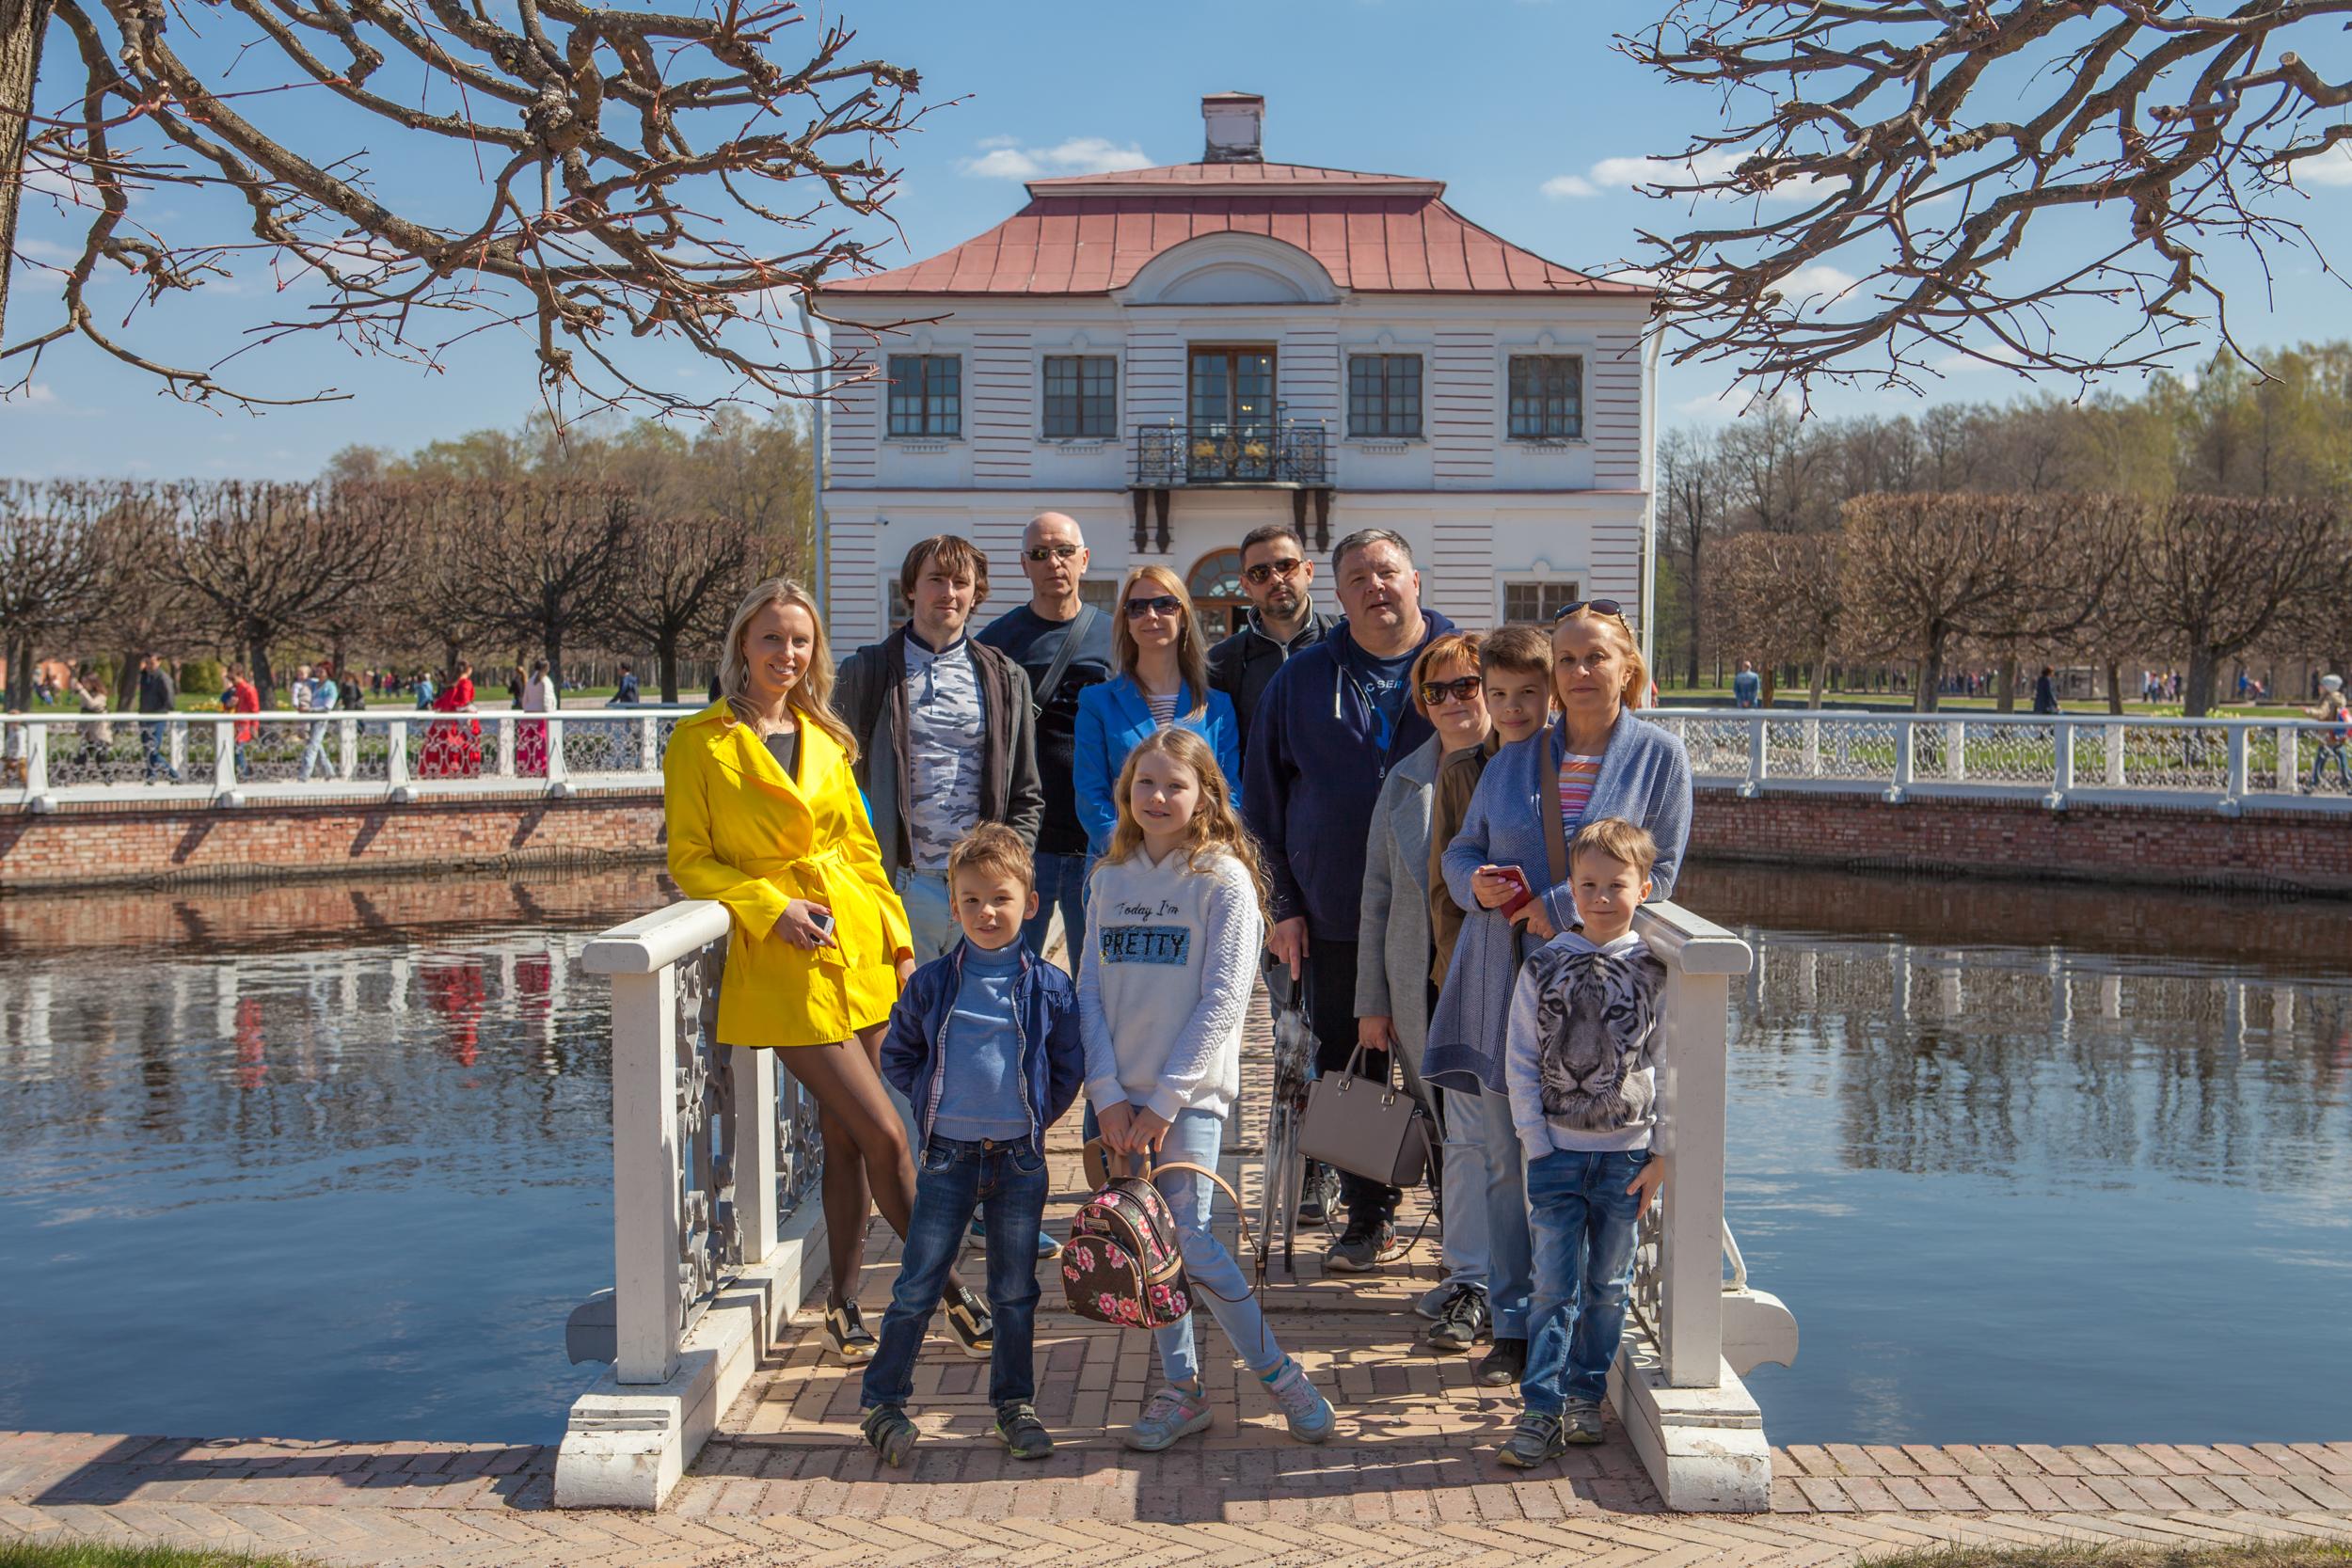 Peterhof photo stroll